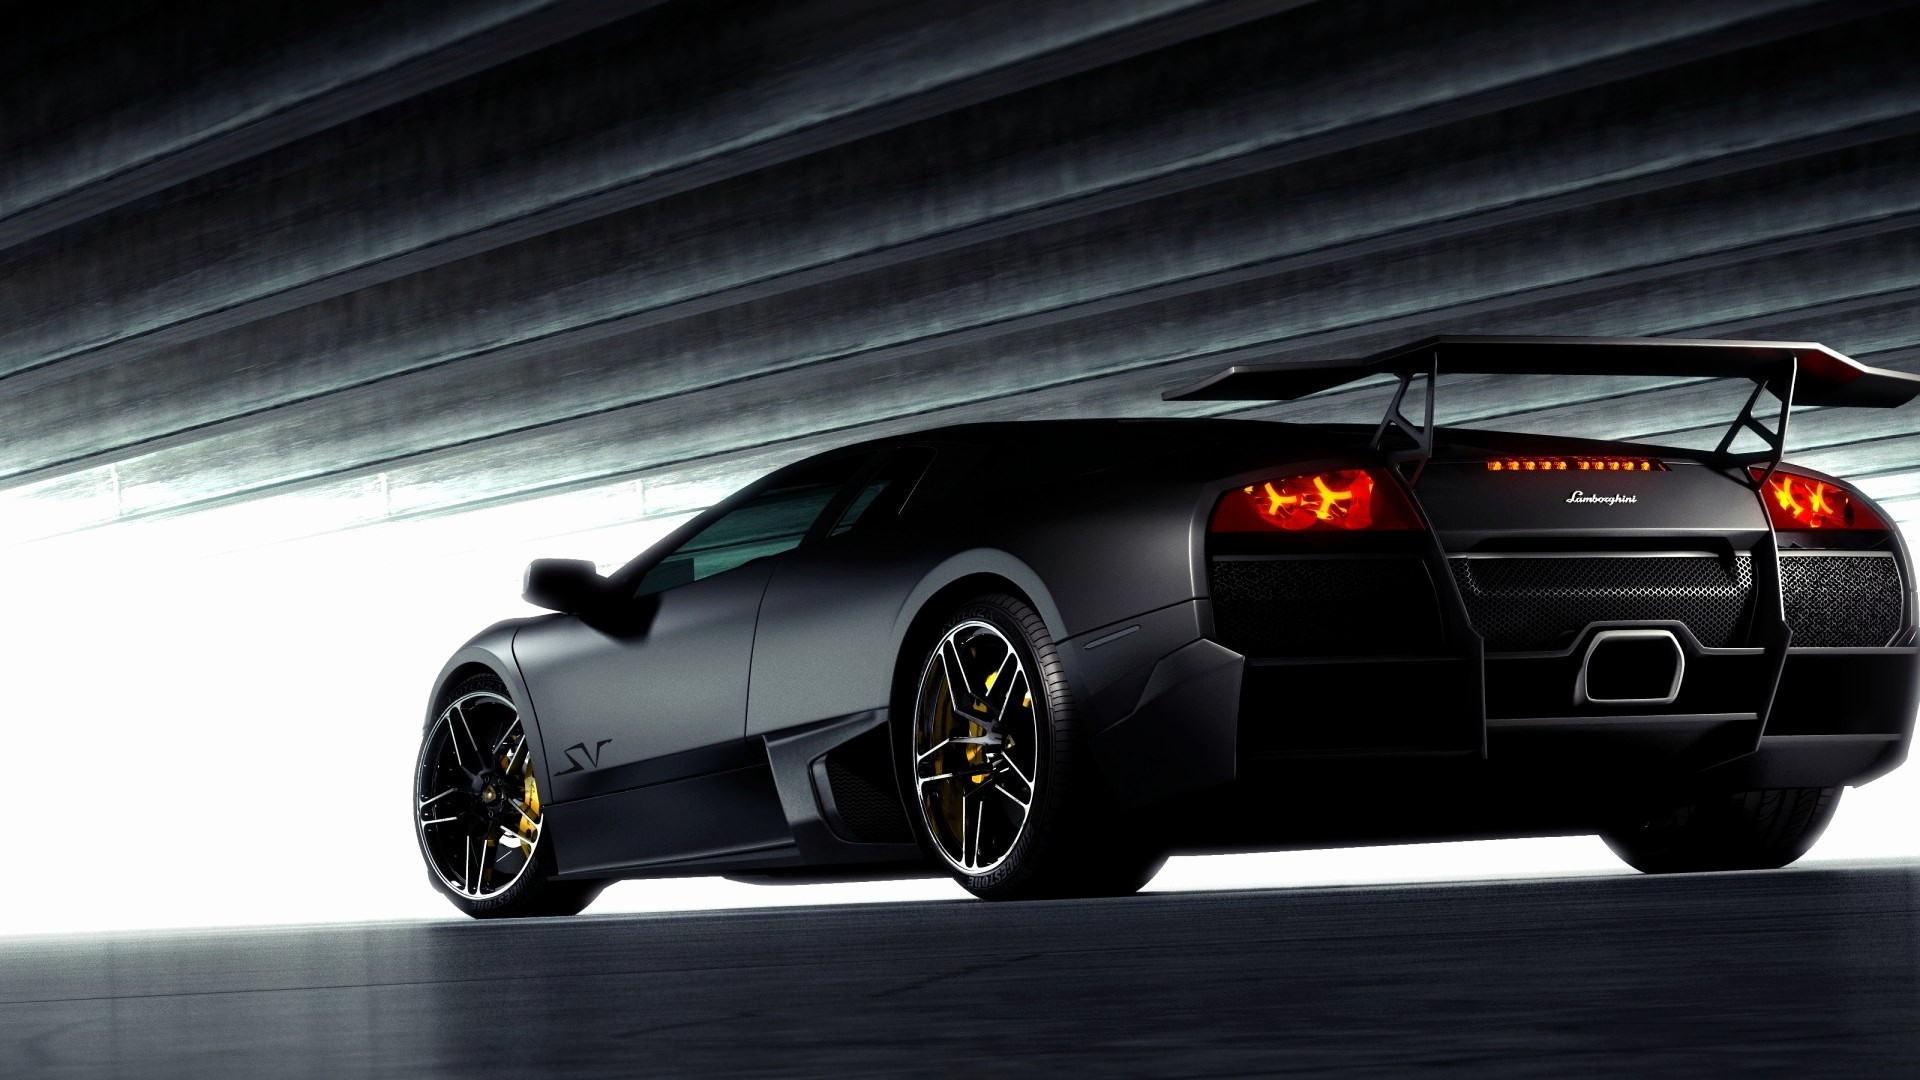 Wallpapers Autos Hd: Wallpaper Full HD 1080p Lamborghini New 2018 (79+ Images